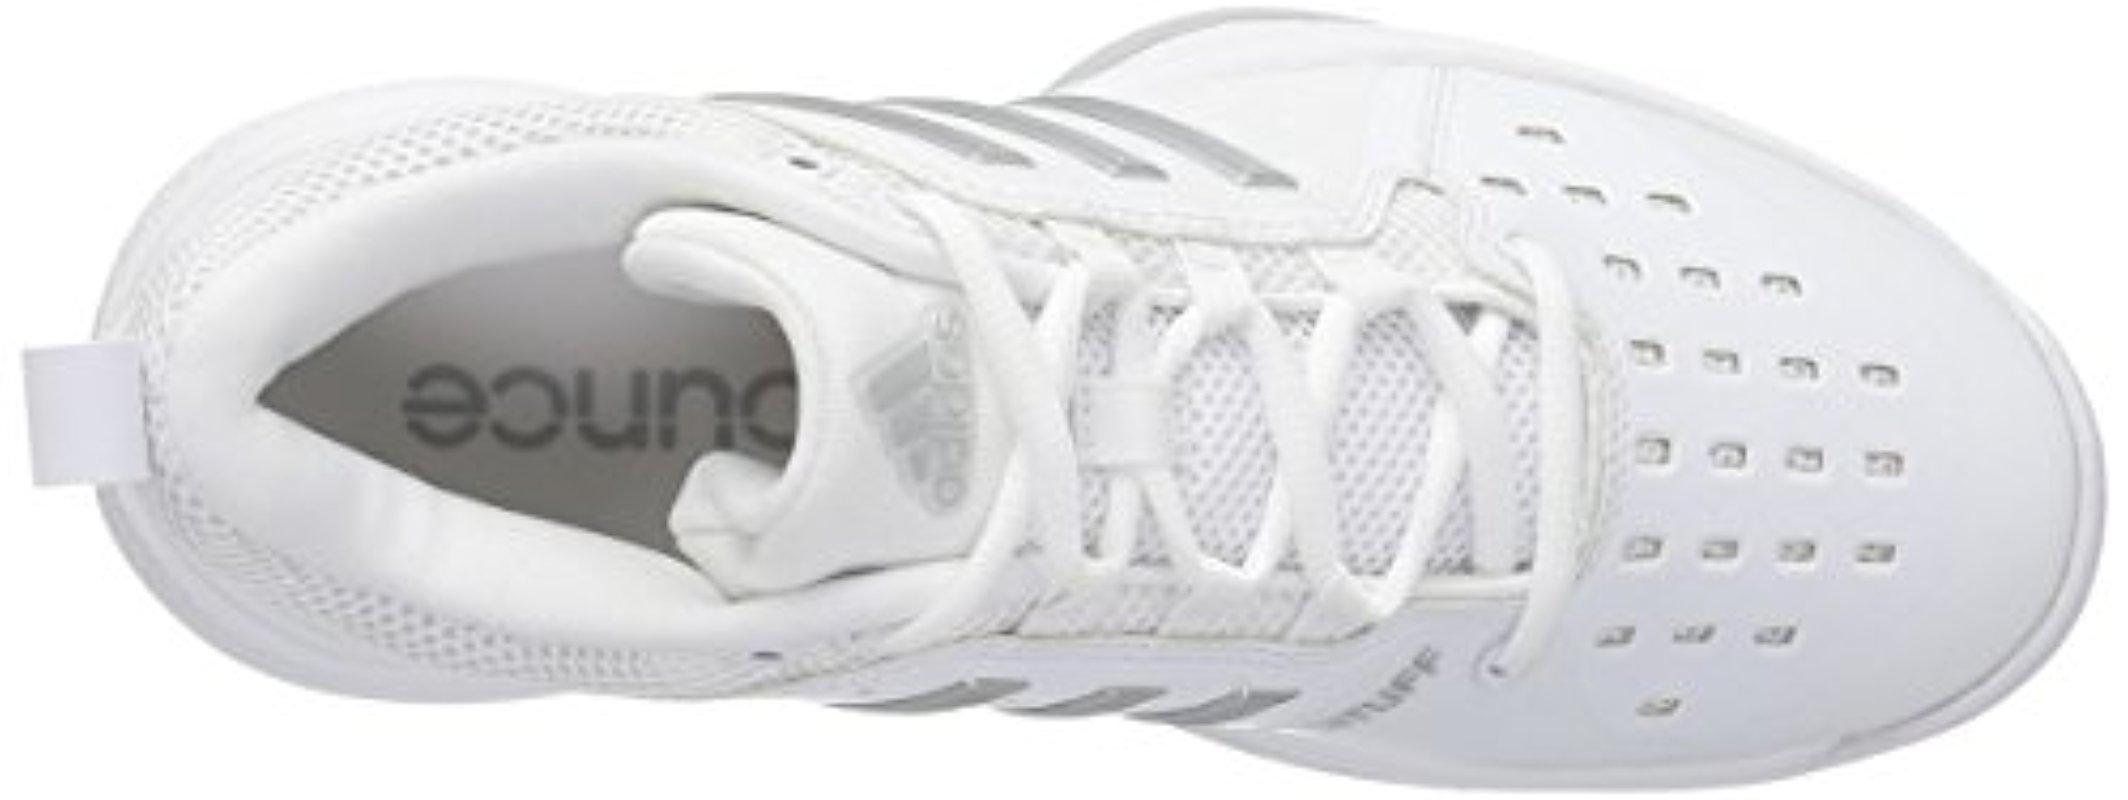 lyst adidas performance barricata classico rimbalzare le scarpe da tennis